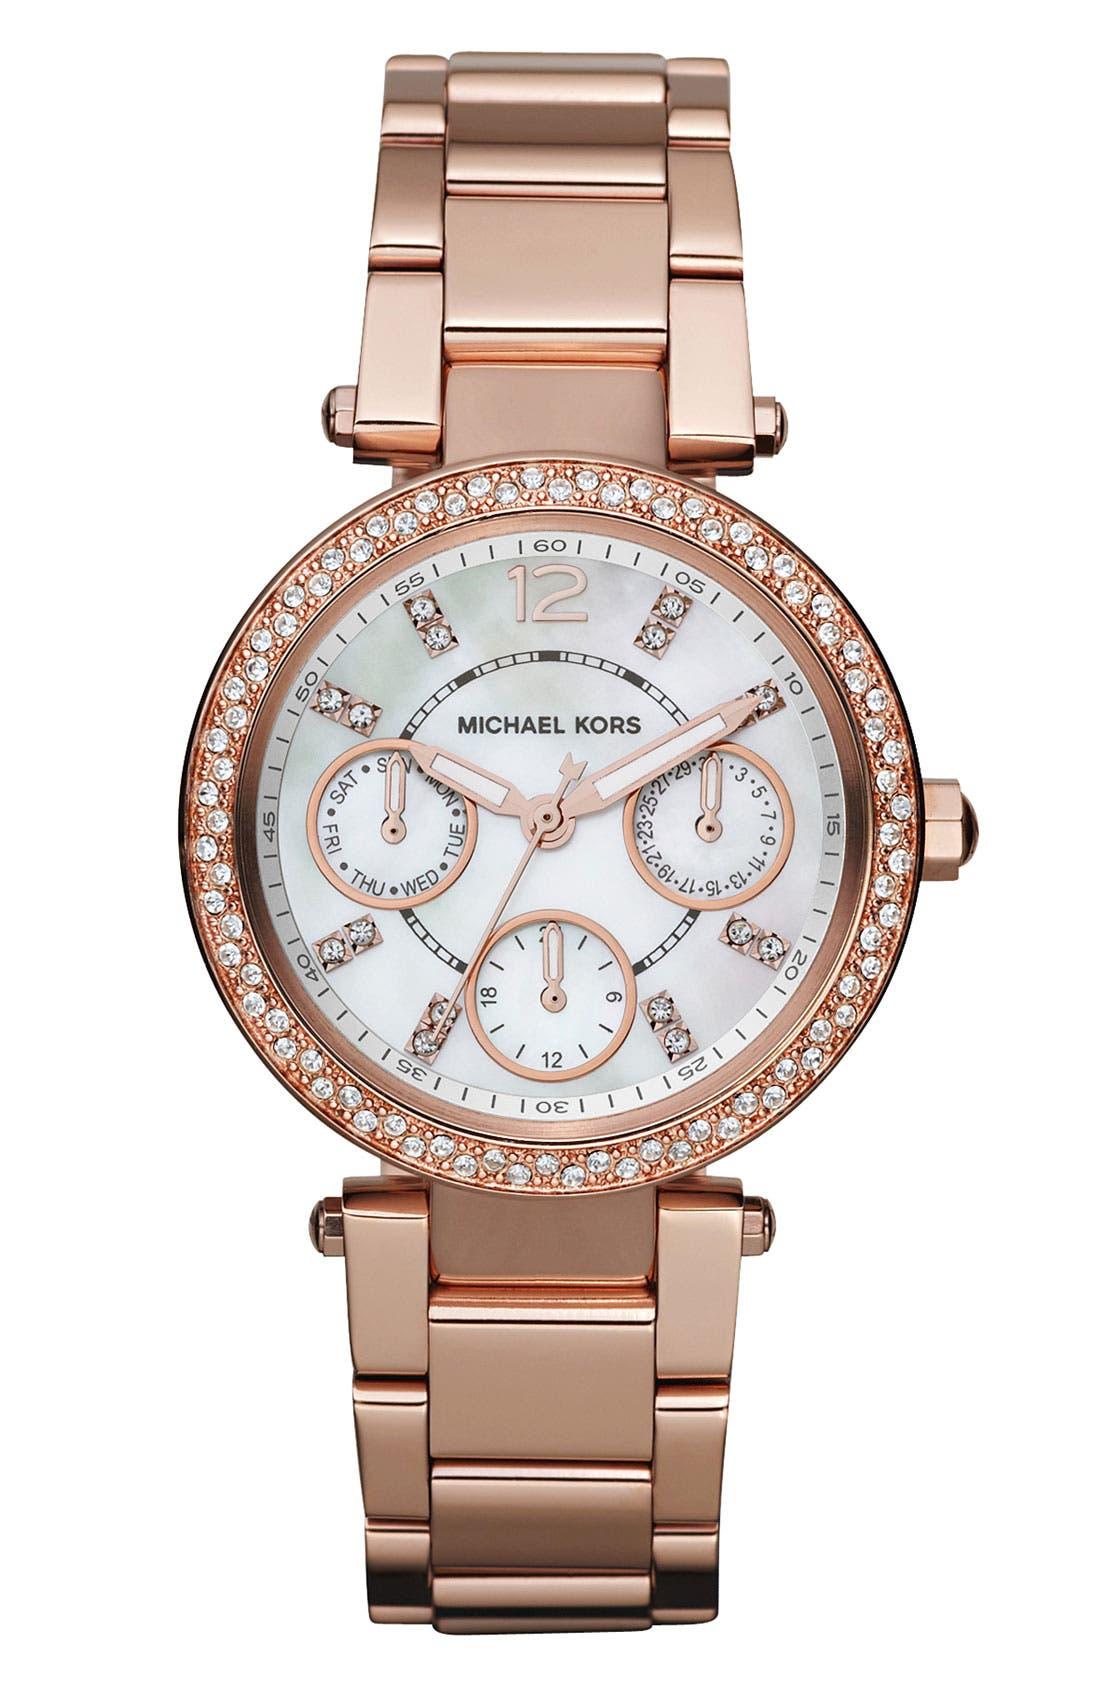 Main Image - Michael Kors 'Parker - Mini' Multifunction Watch, 33mm